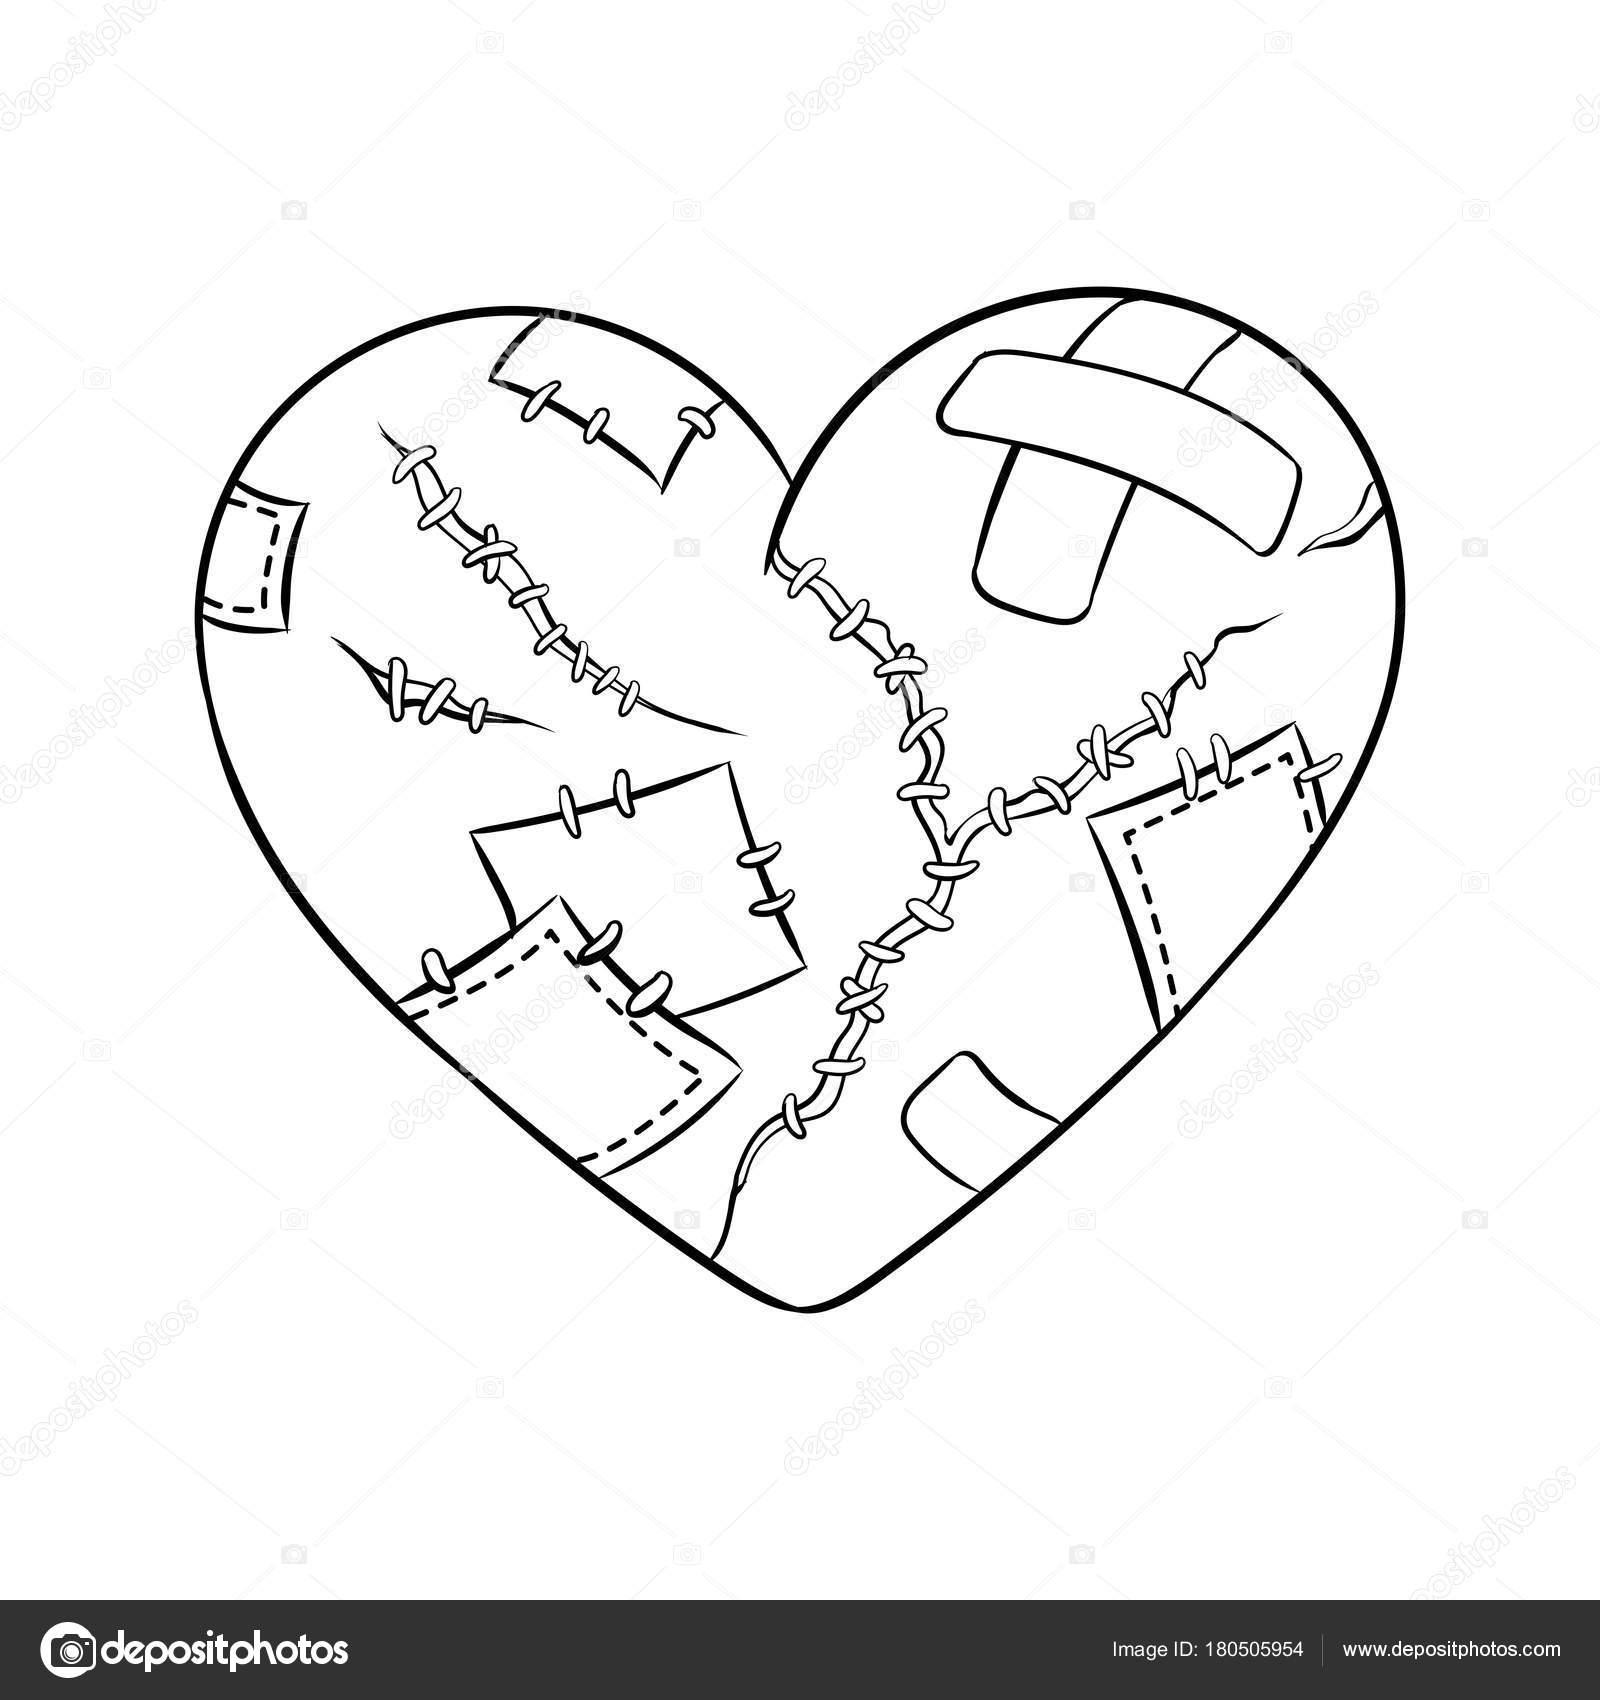 Gebrochenes Herz Metapher Färbung Buch Vektor Stockvektor